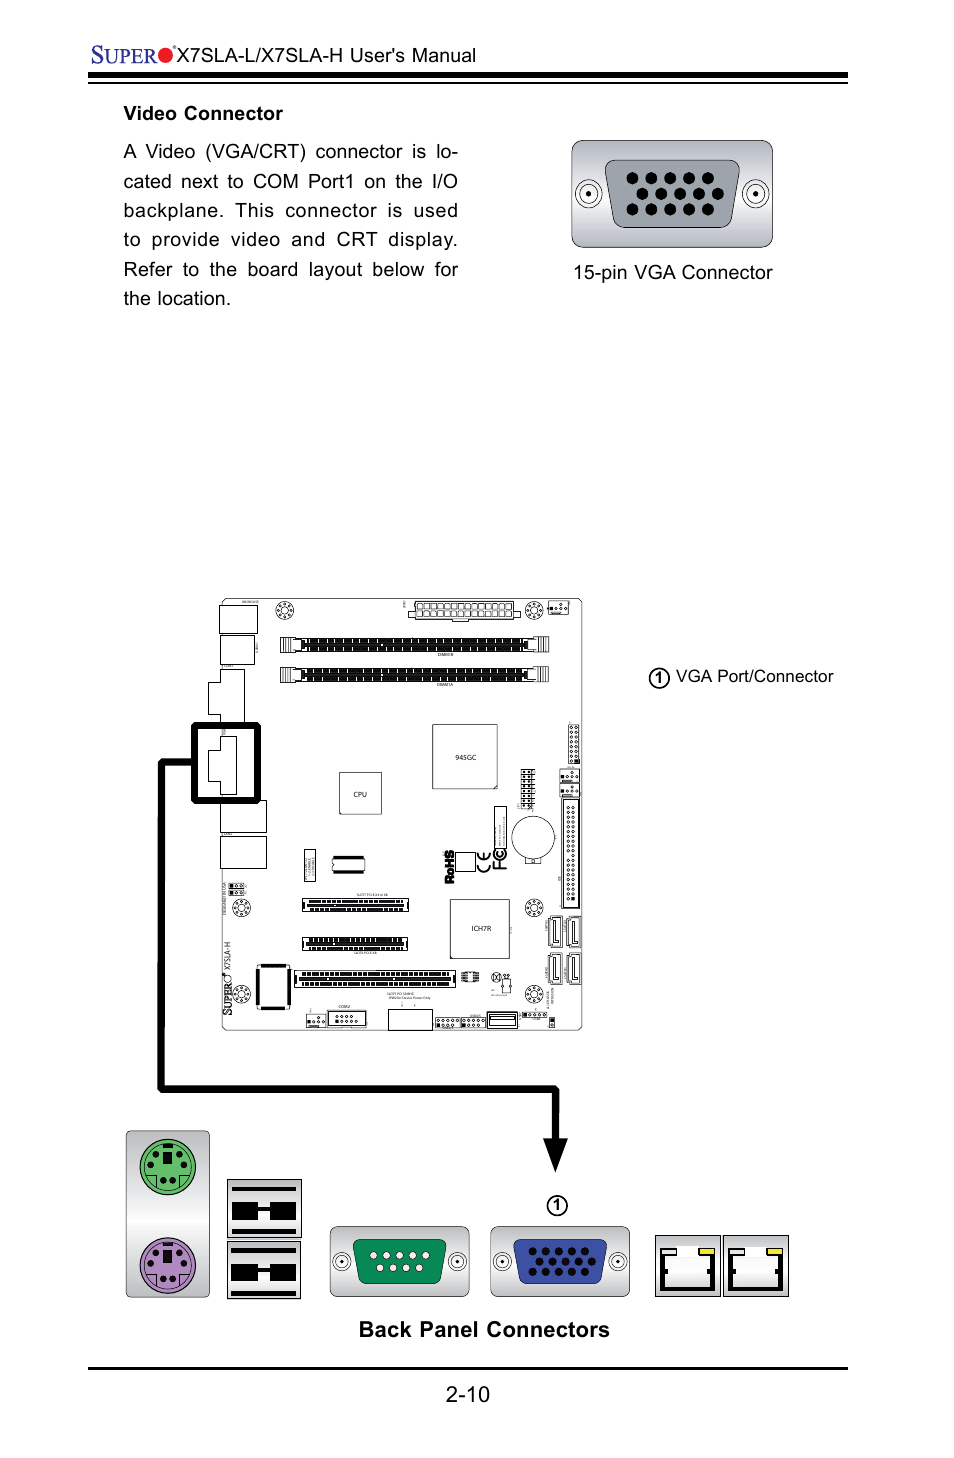 medium resolution of back panel connectors x7sla l x7sla h user s manual pin vga